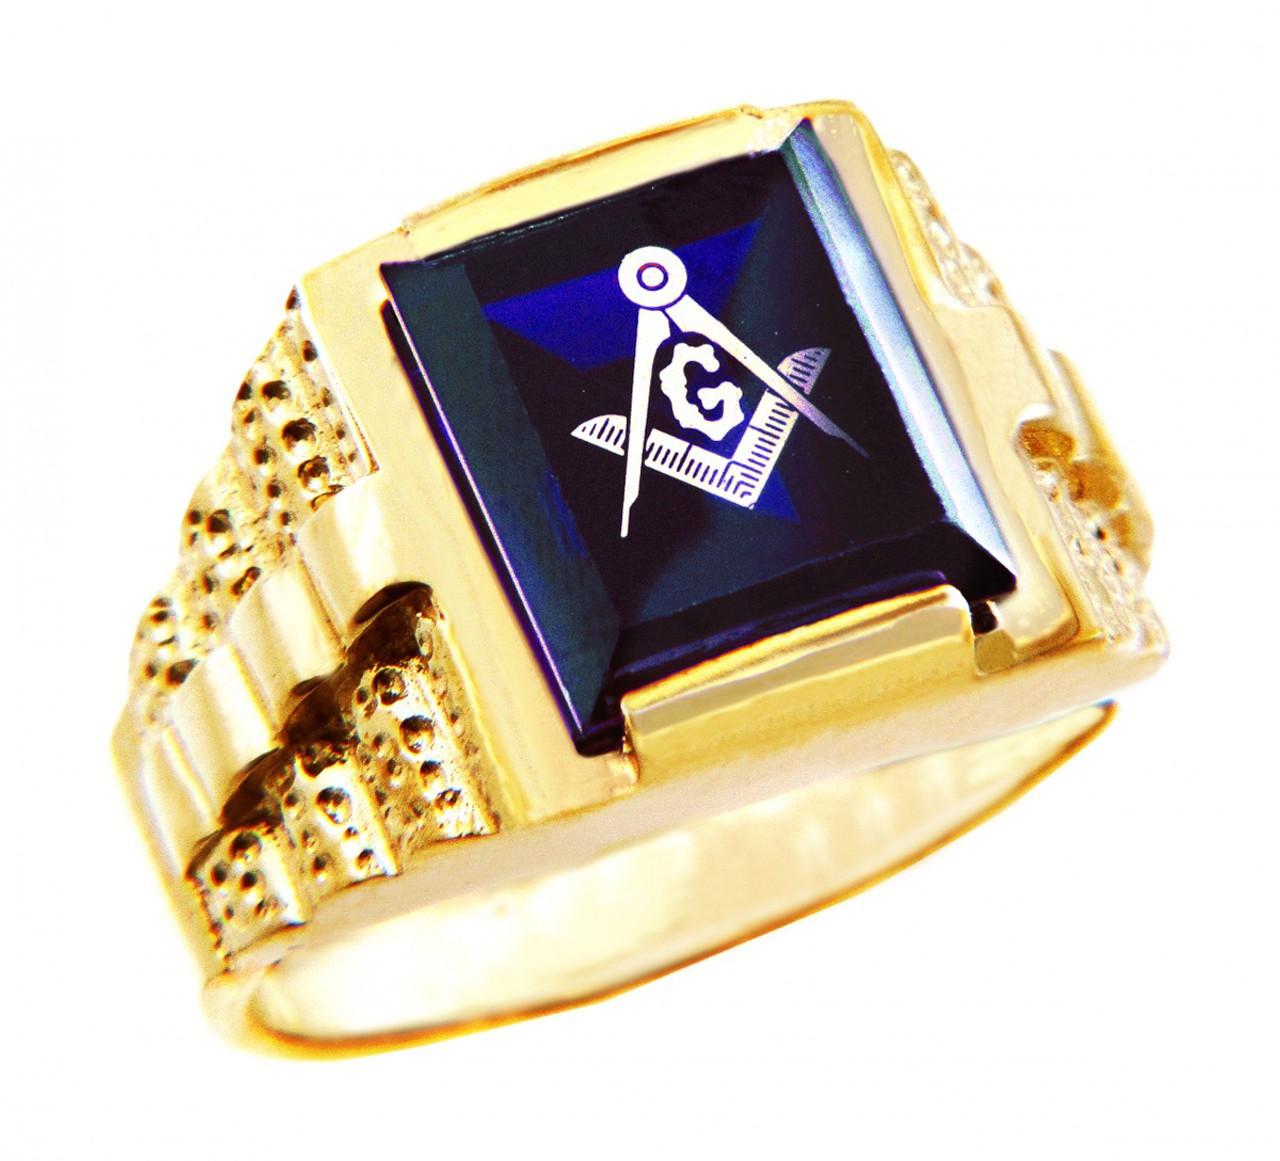 Freemason Blue Square and Compass Gold Masonic Men's Ring